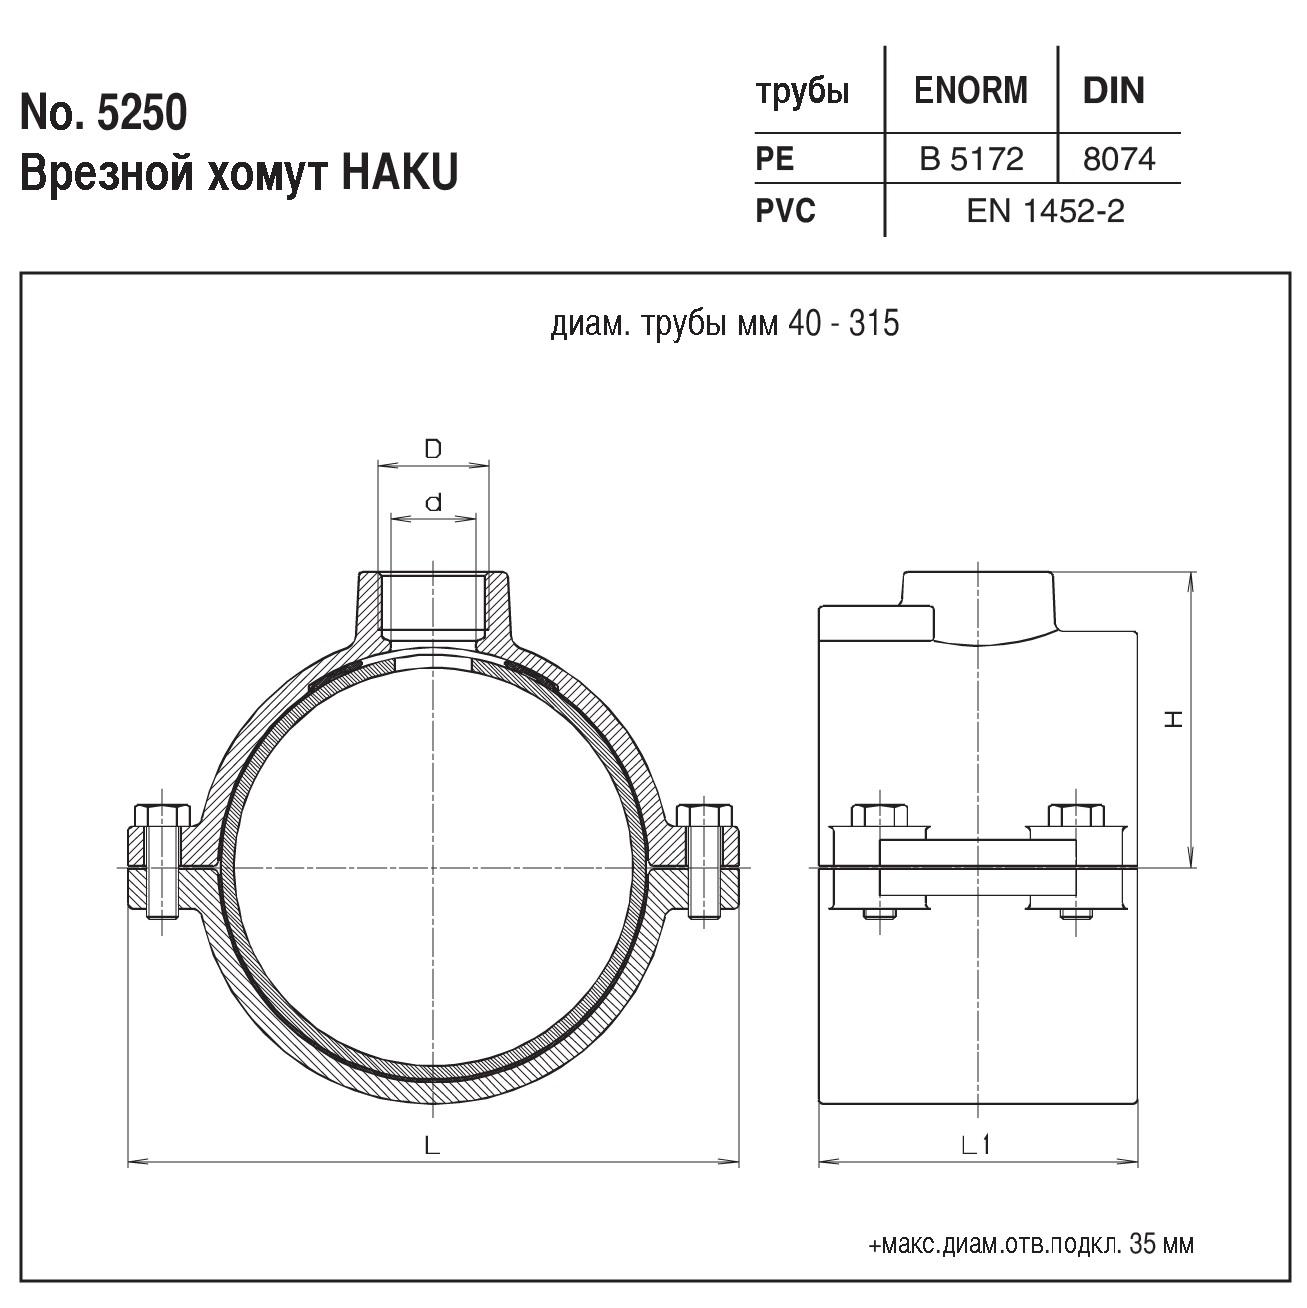 Чертеж для Врезной хомут Hawle HAKU 5250 резьбовой для ПЭ и ПВХ труб DN250